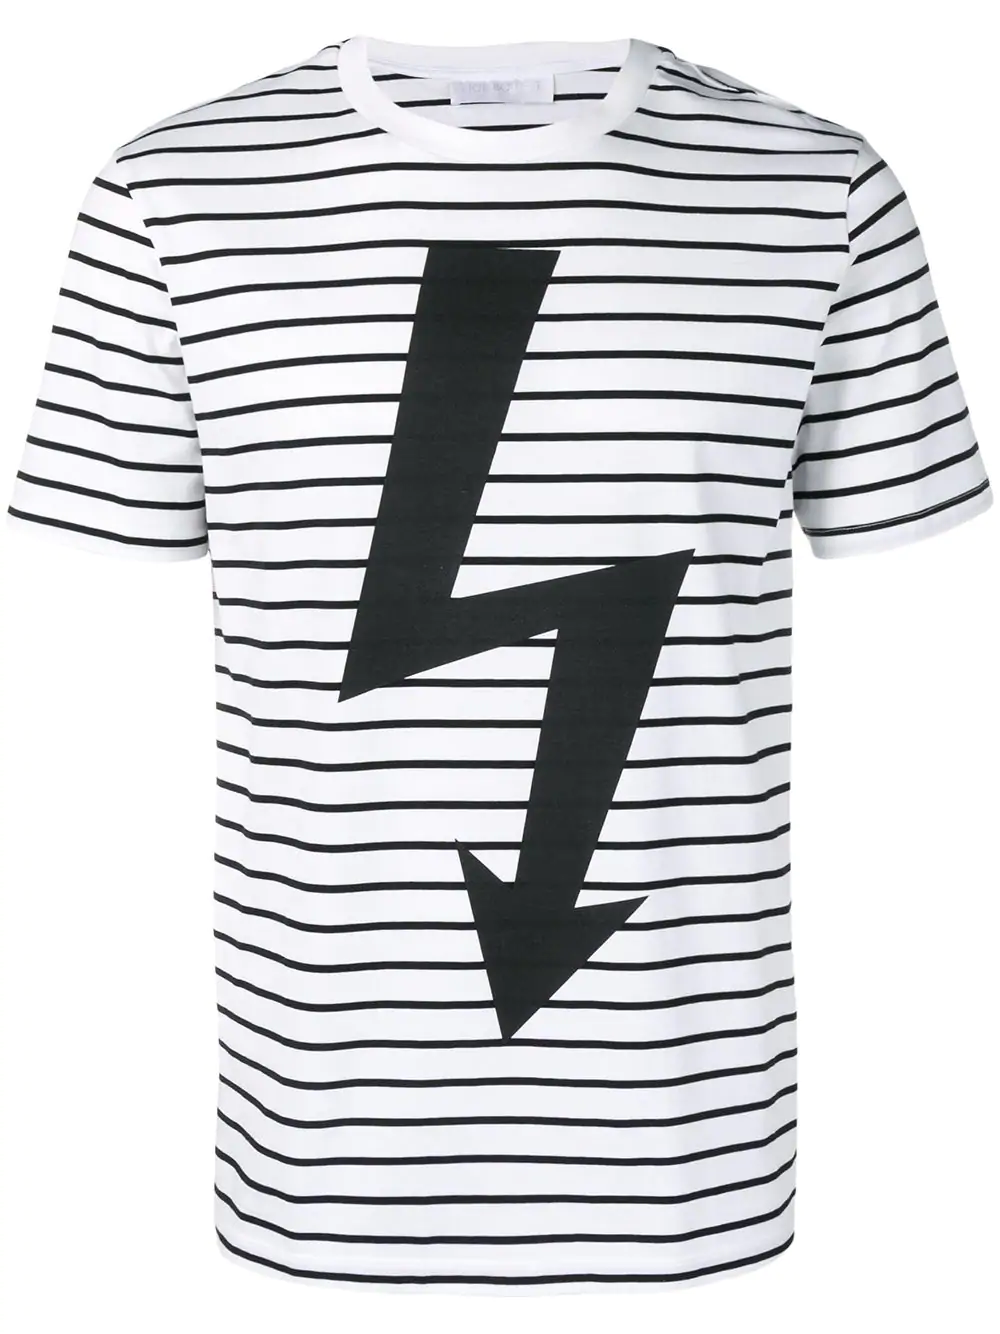 2d0de7b3 Neil Barrett Striped Lightning Bolt T-Shirt - White | ModeSens